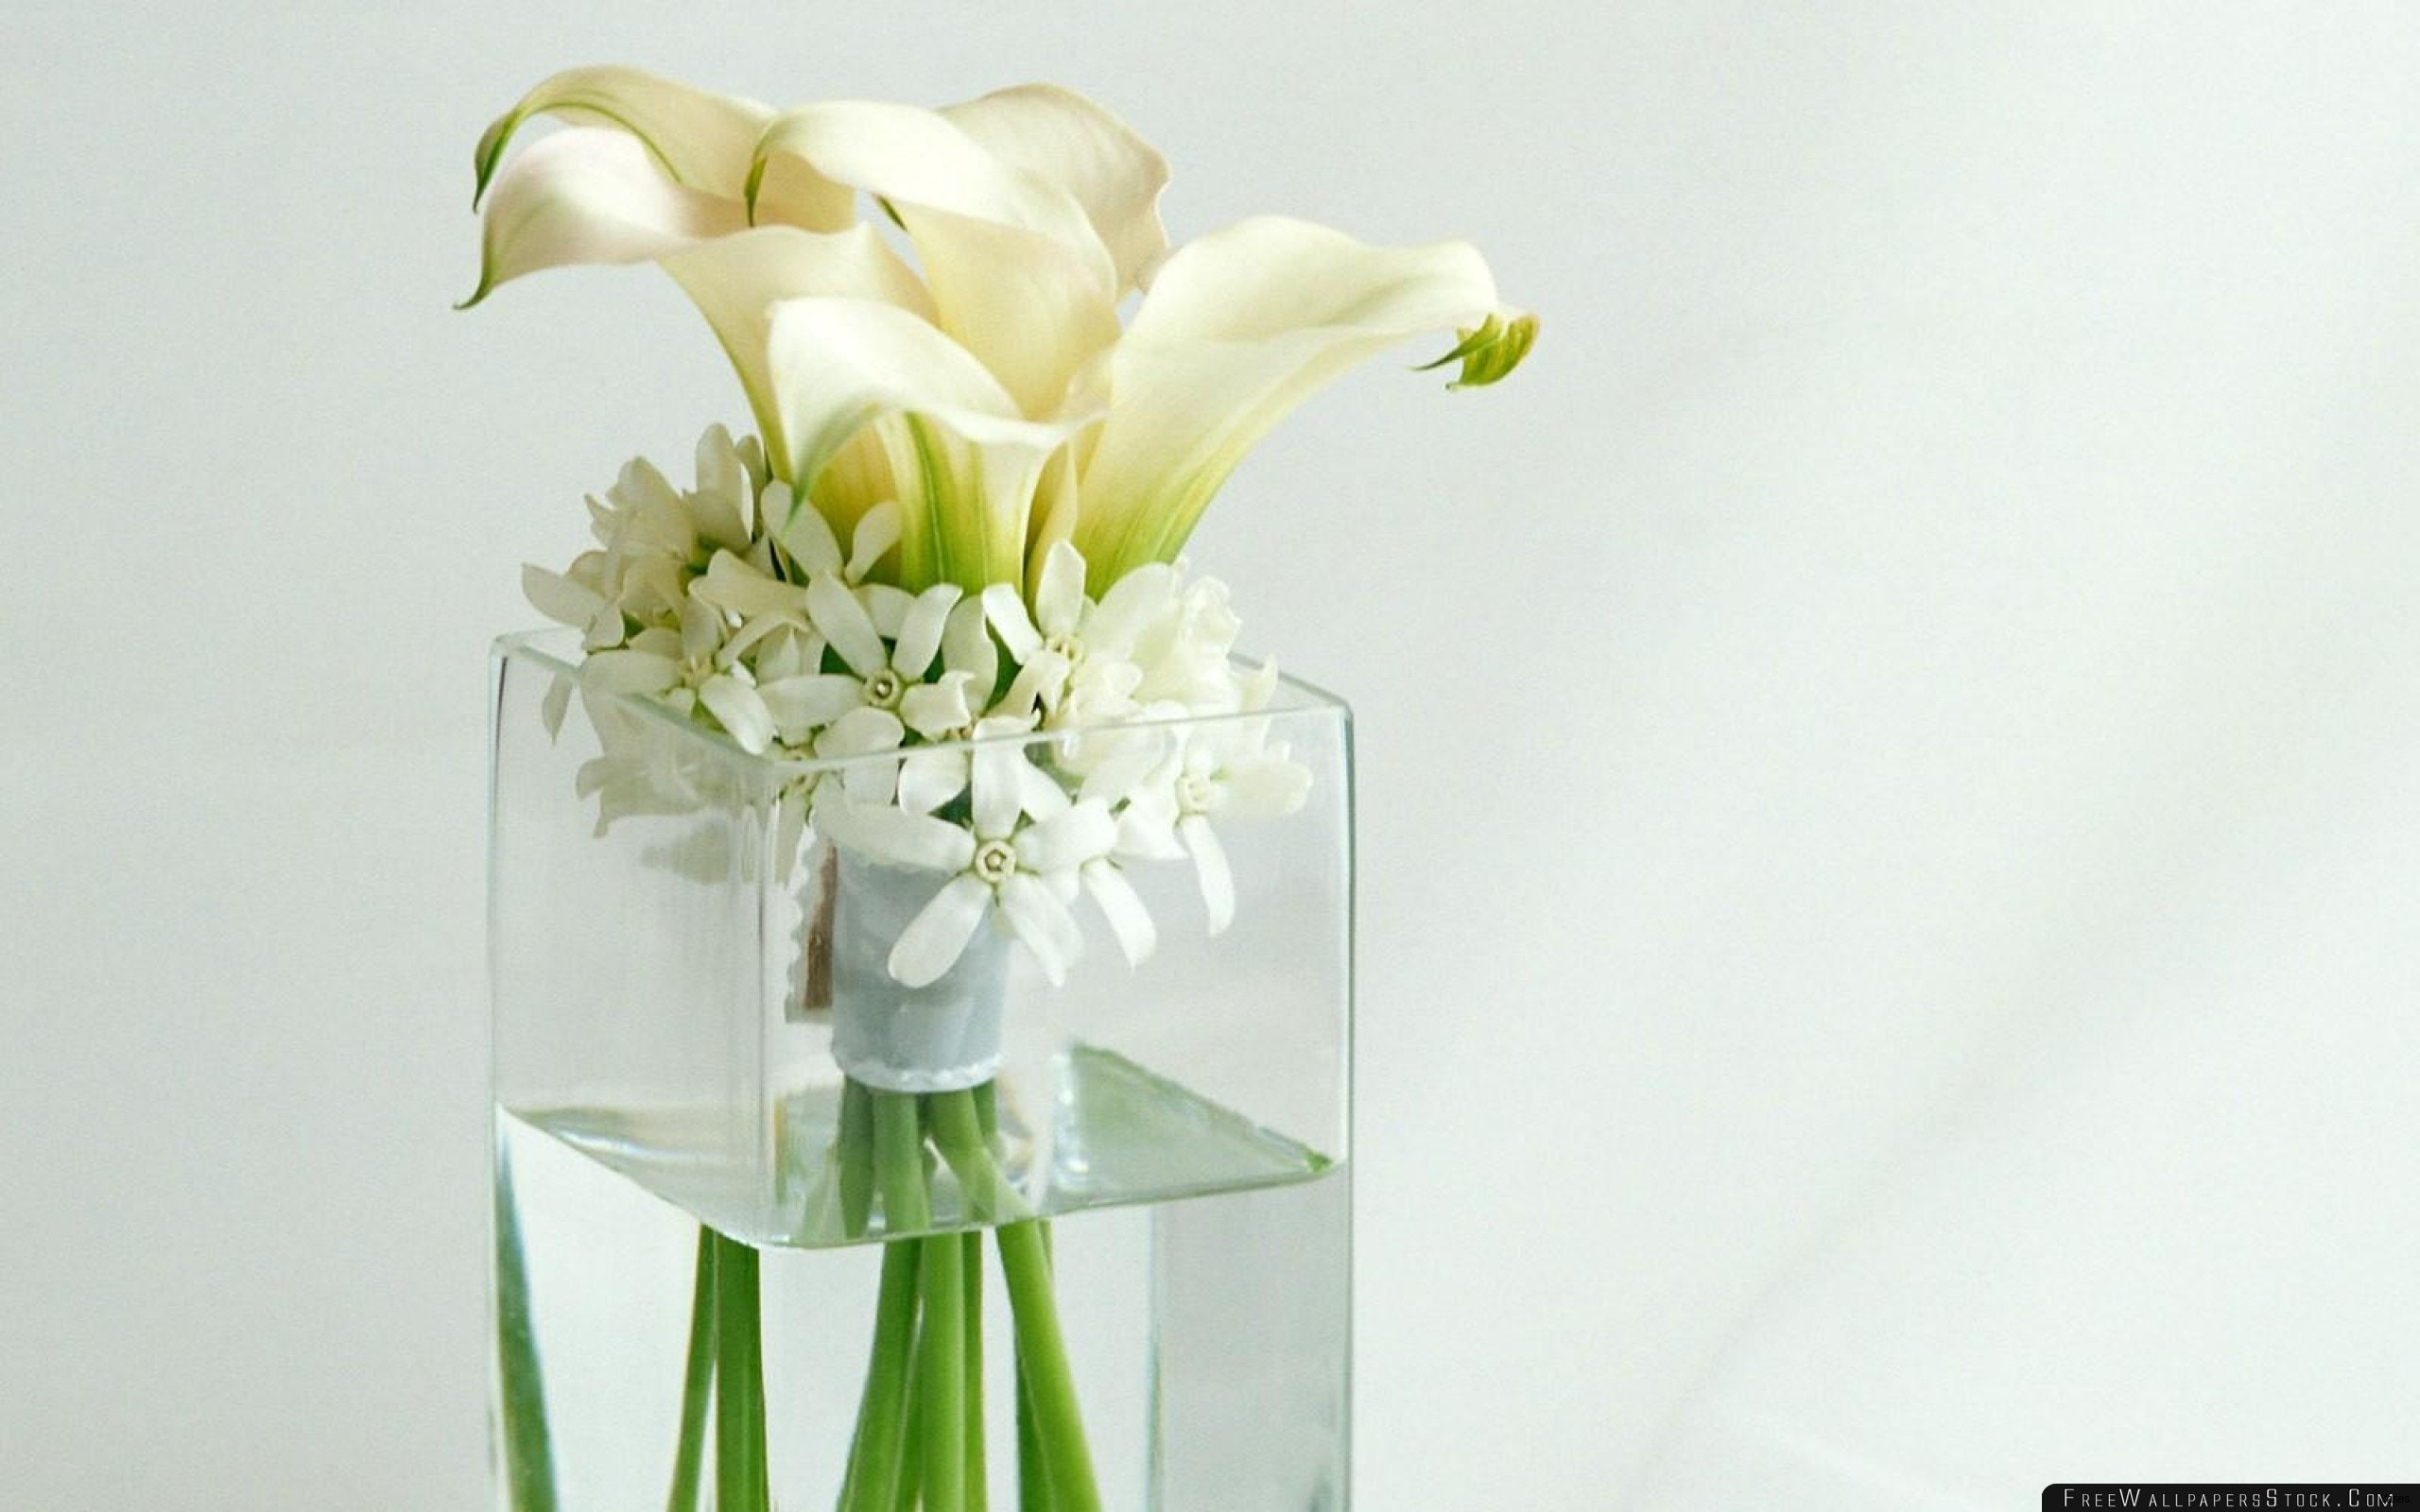 modern blue vase of rectangle flower vases images interesting big flower vase floor with rectangle flower vases image tall vase centerpiece ideas vases flowers in water 0d artificial of rectangle